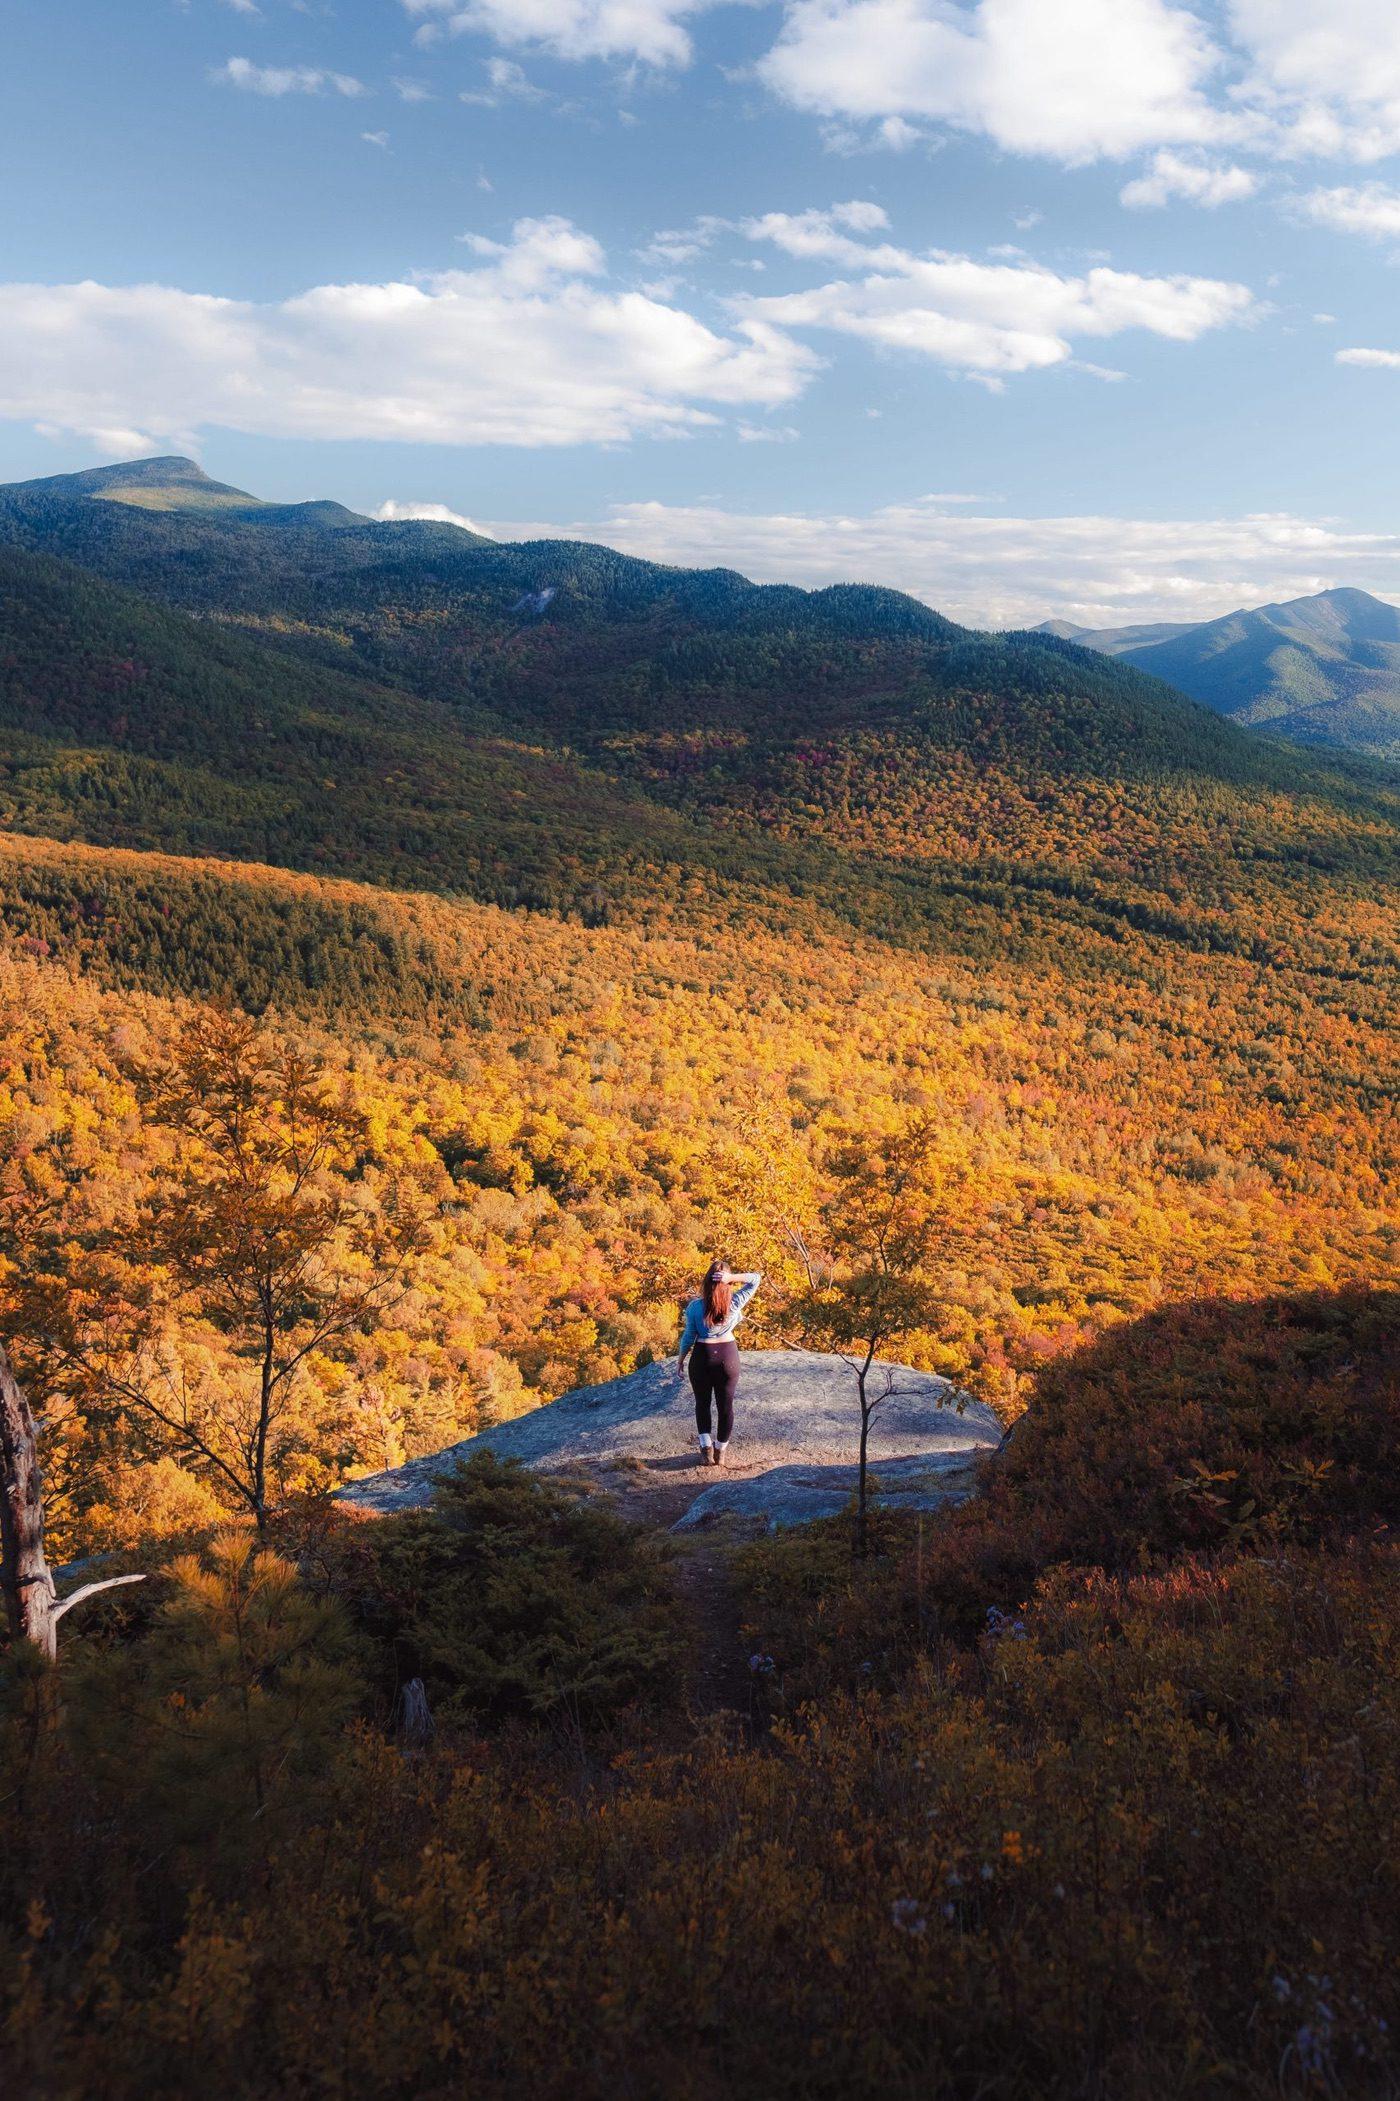 Baxter Mountain, Keene Valley, Adirondacks